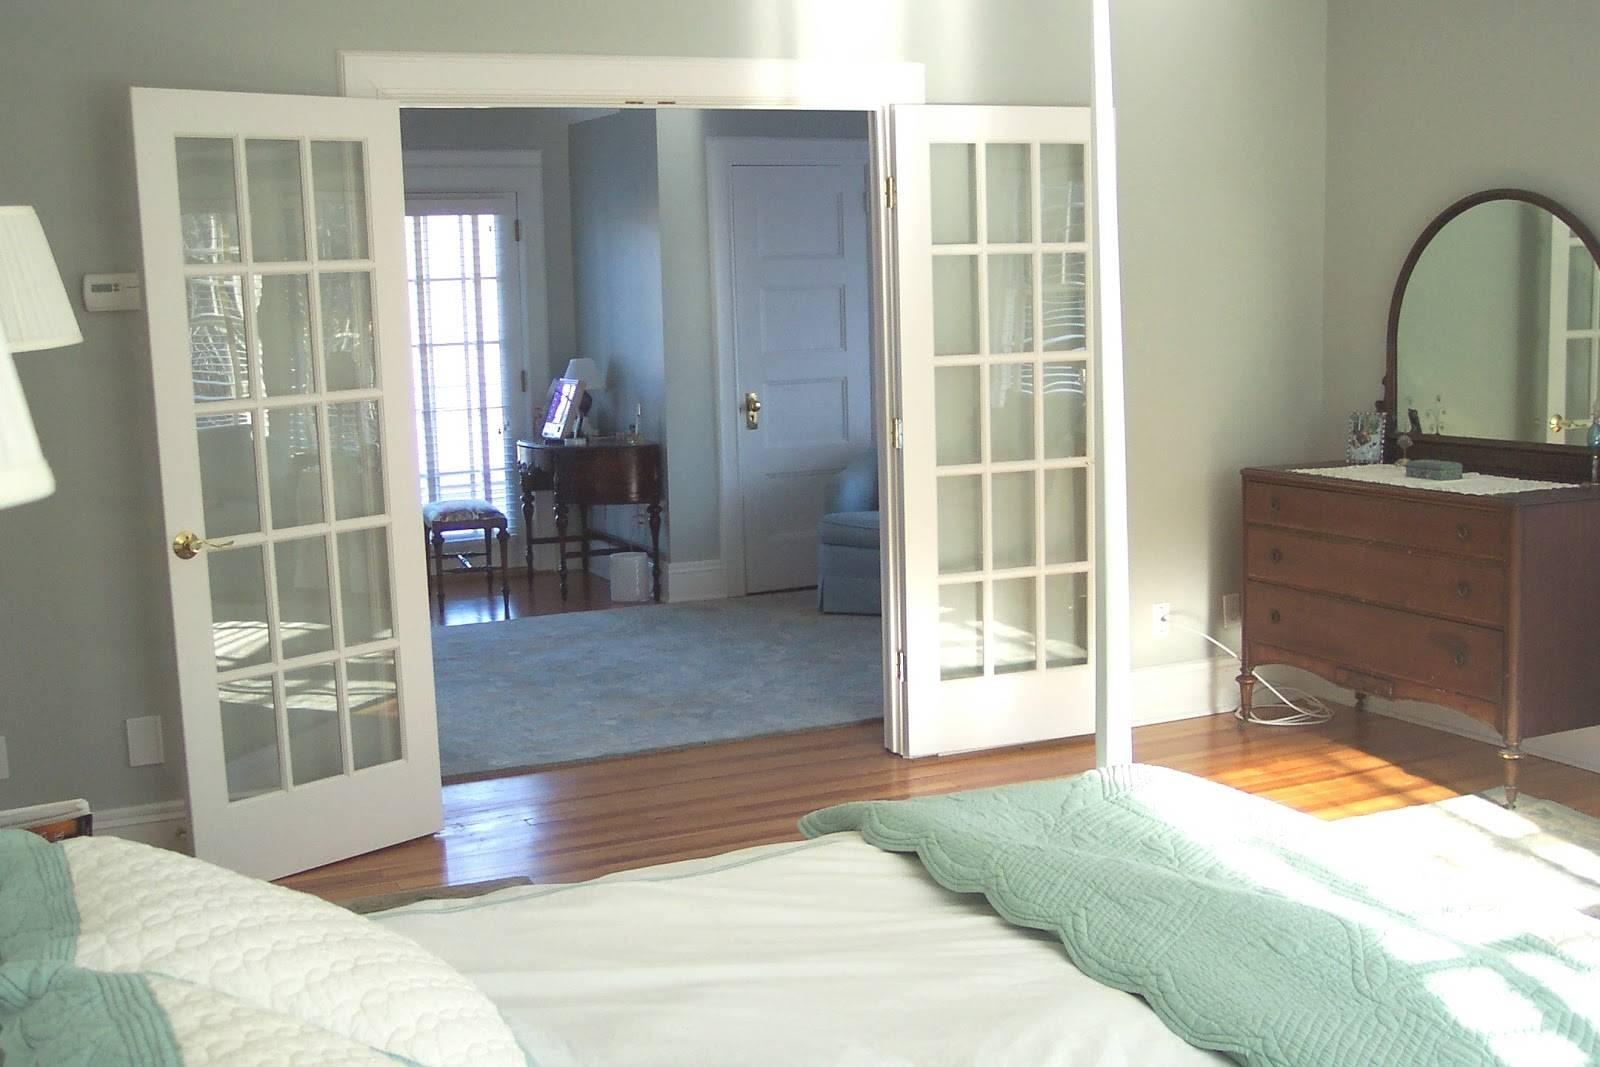 Artistic And Simple Analogous Color Scheme Interior Design ...